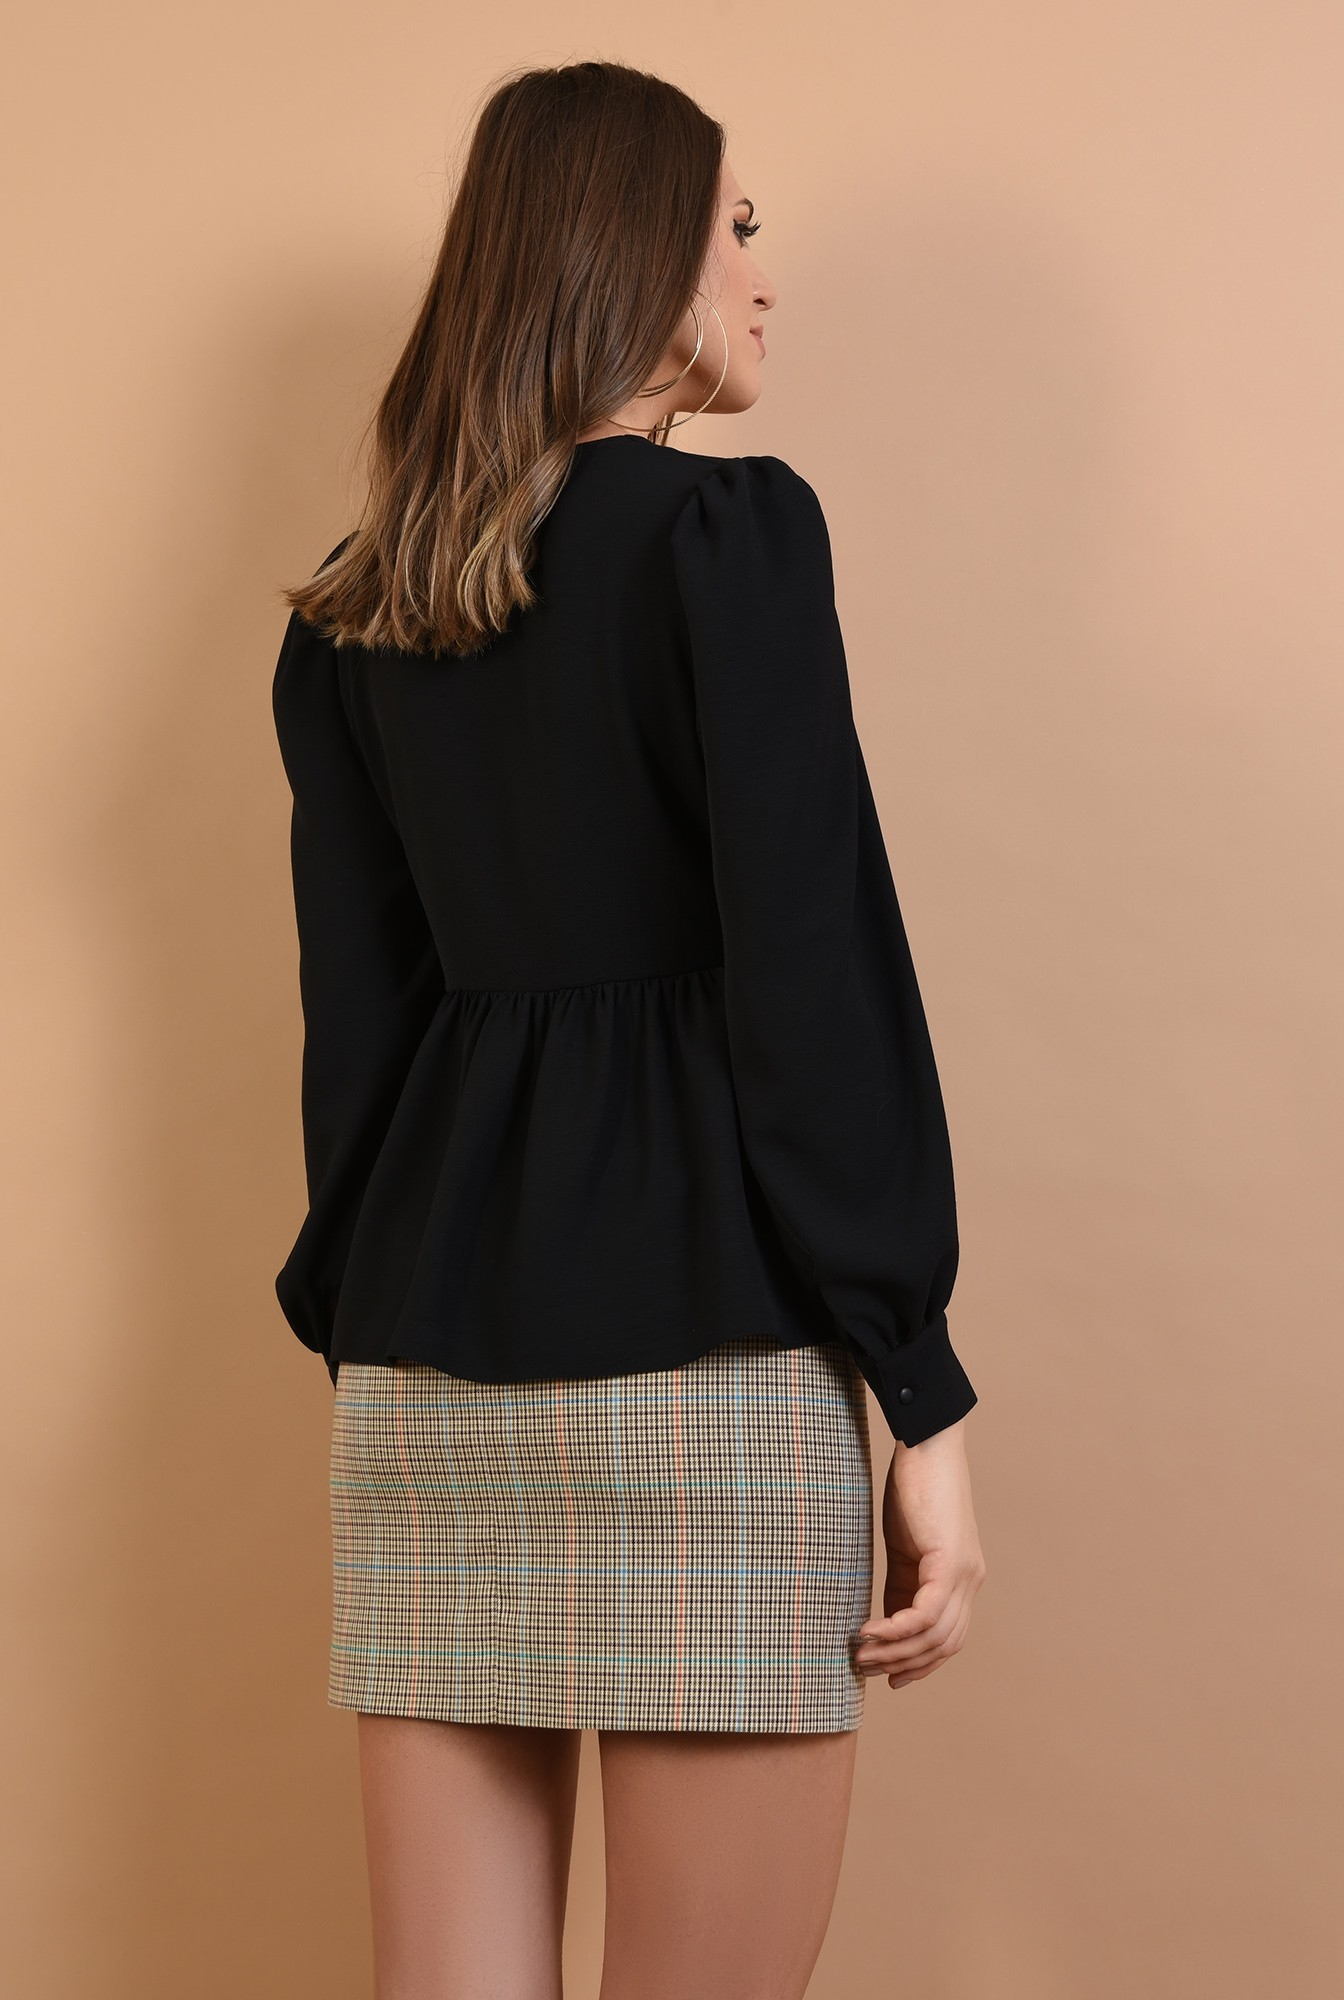 1 - bluza casual, cu peplum, neagra, anchior, Poema